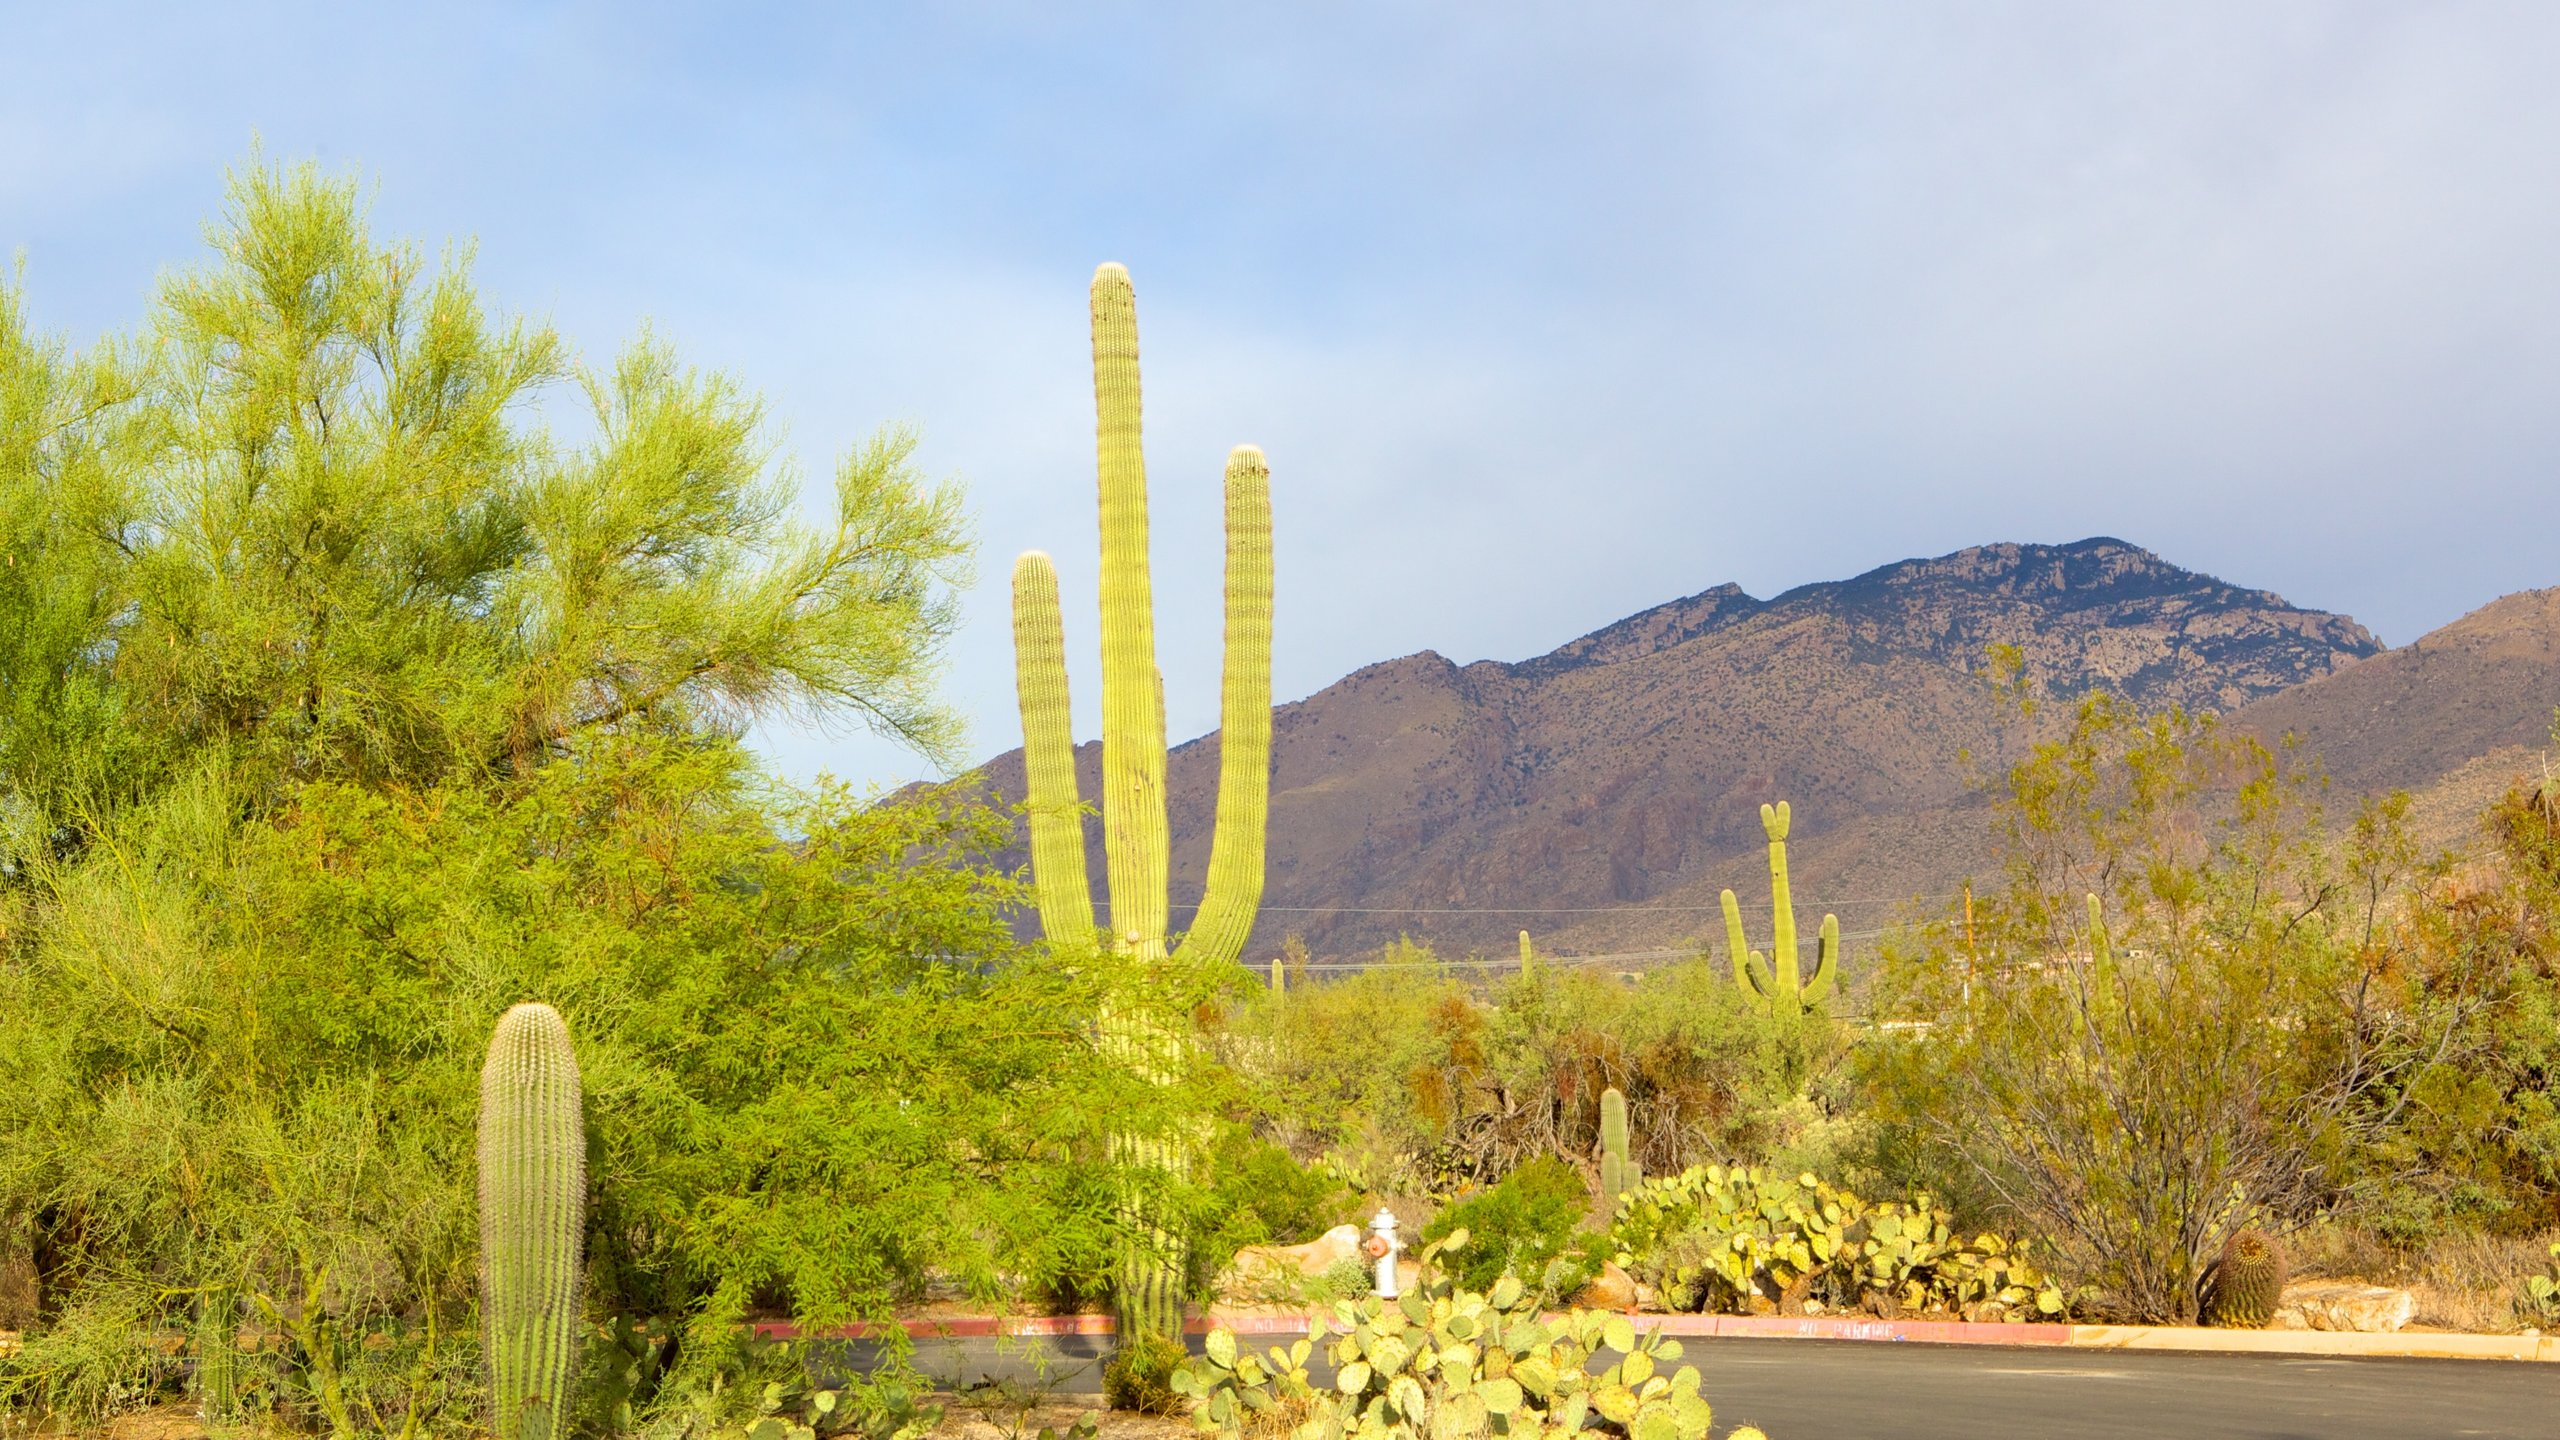 Sabino Canyon, Tucson, Arizona, United States of America